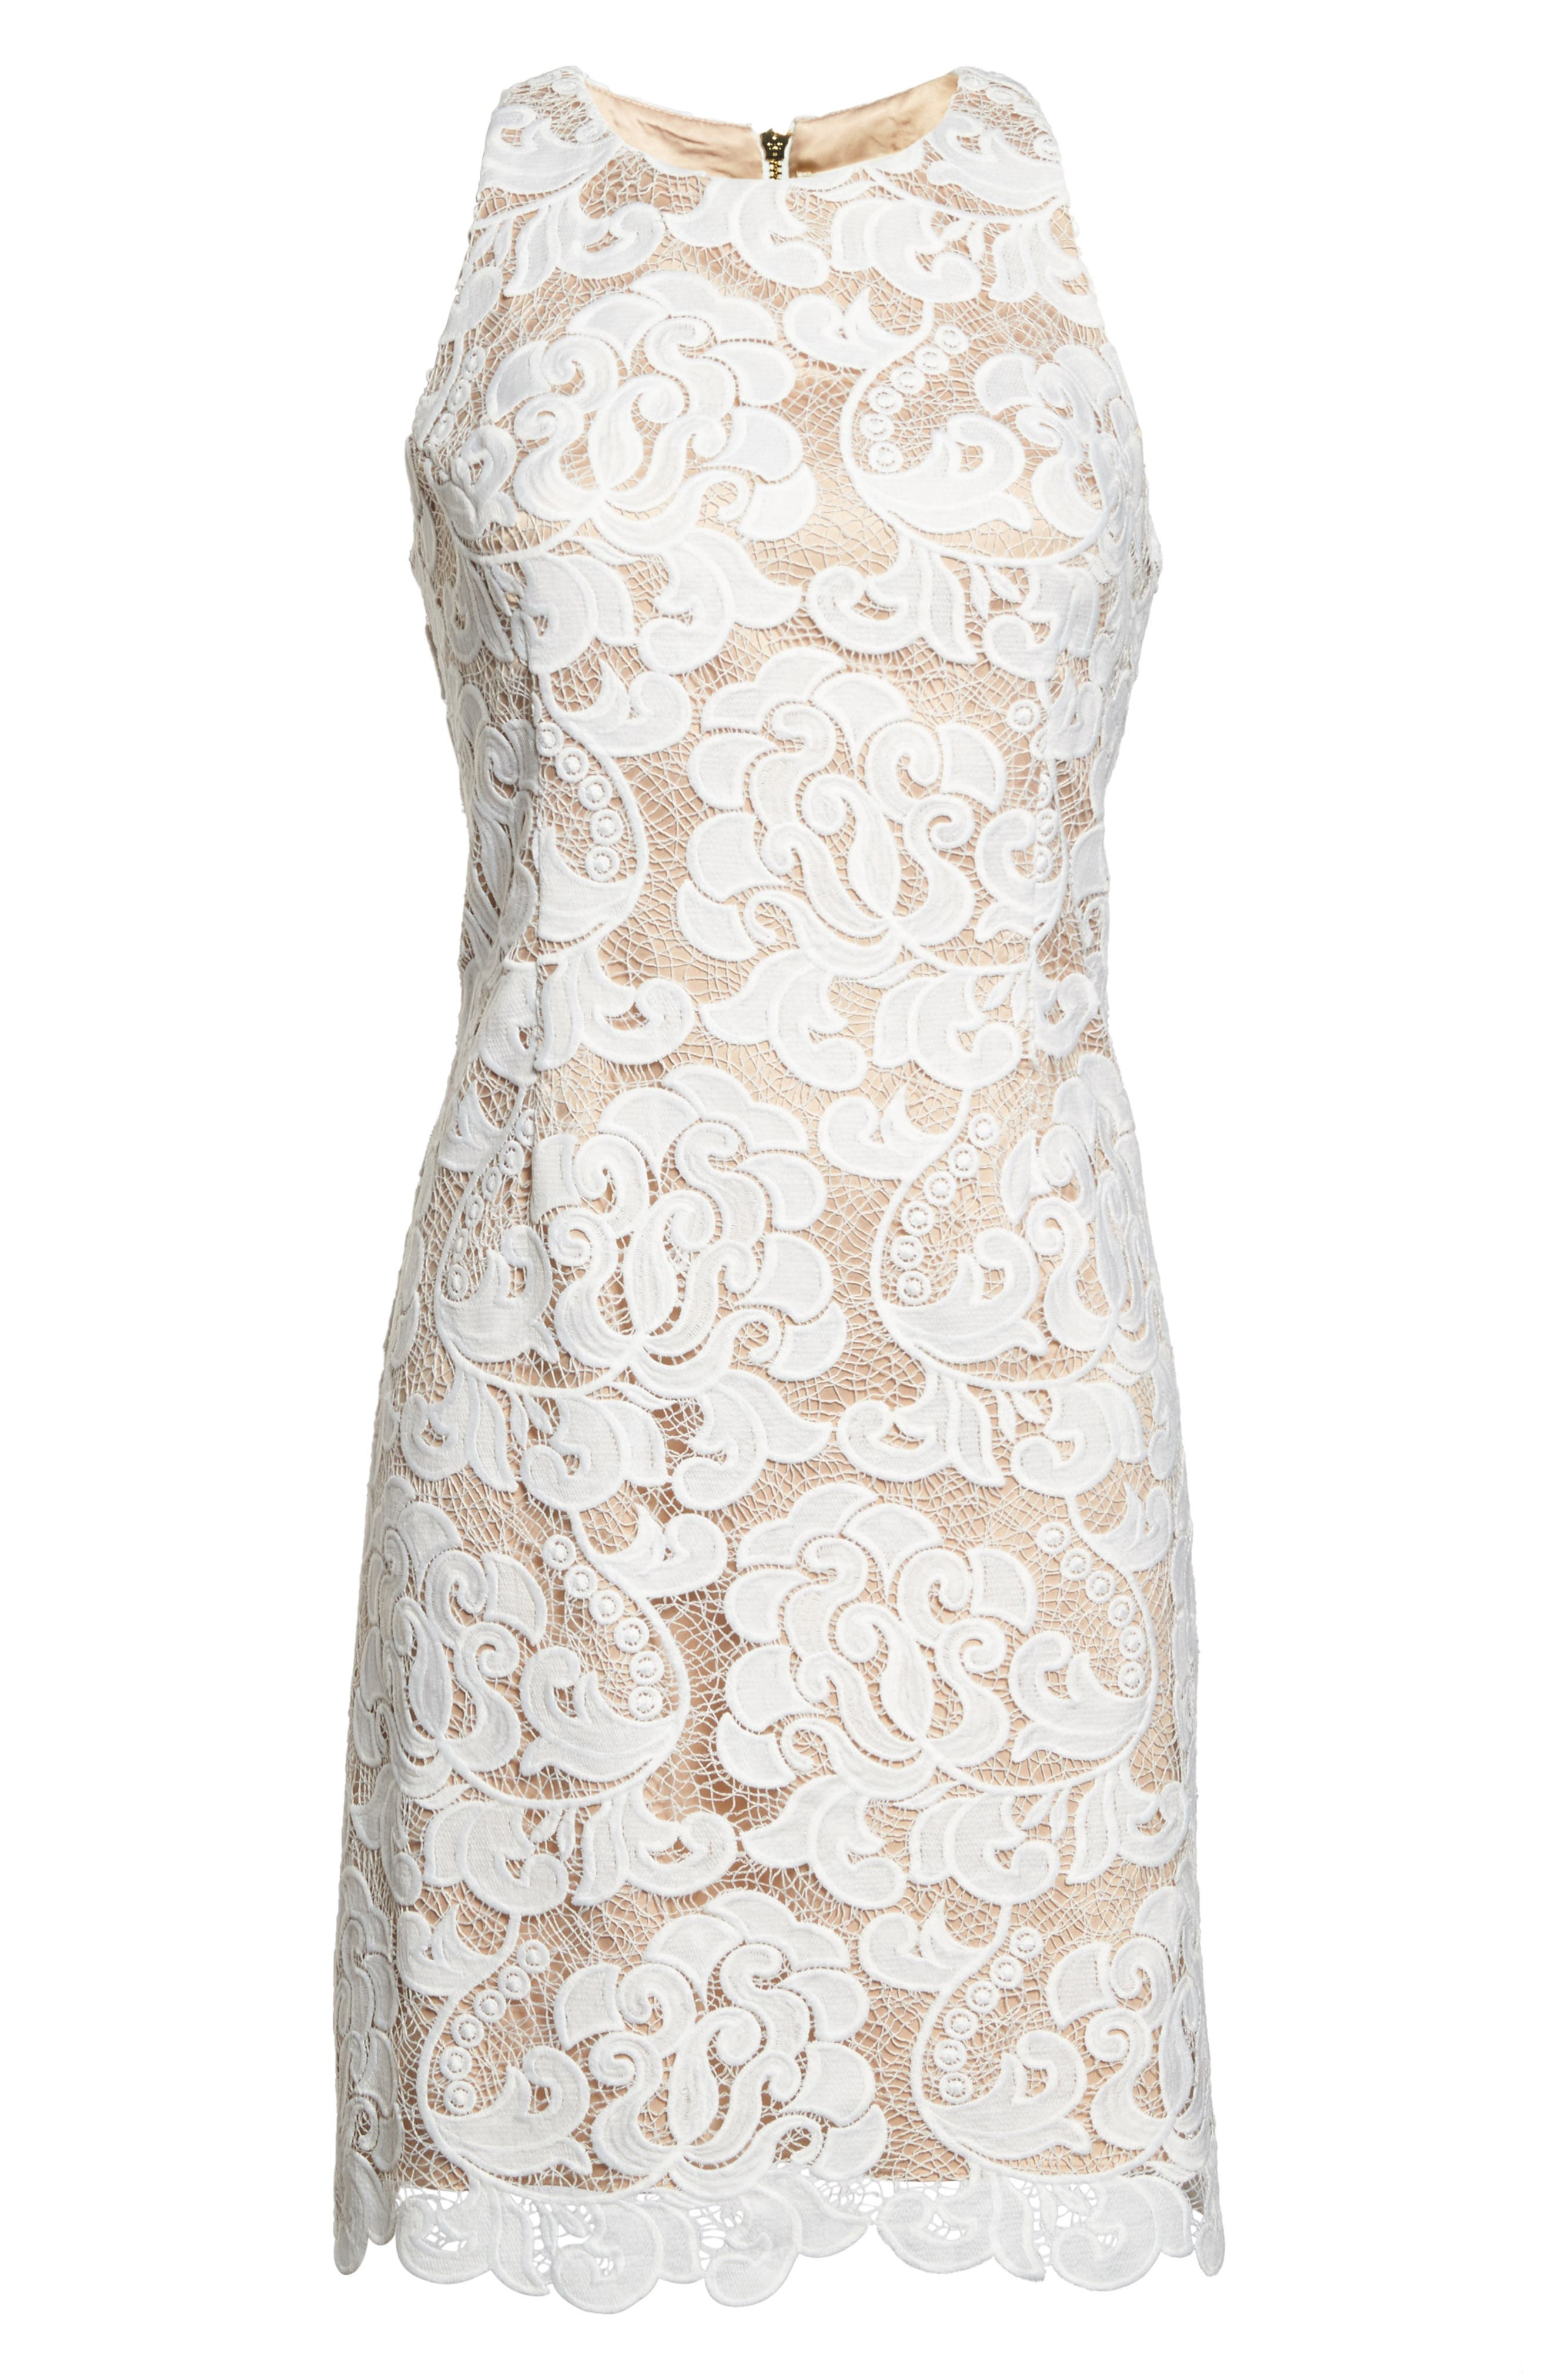 Lace Sheath Dress,                             Alternate thumbnail 8, color,                             IVORY